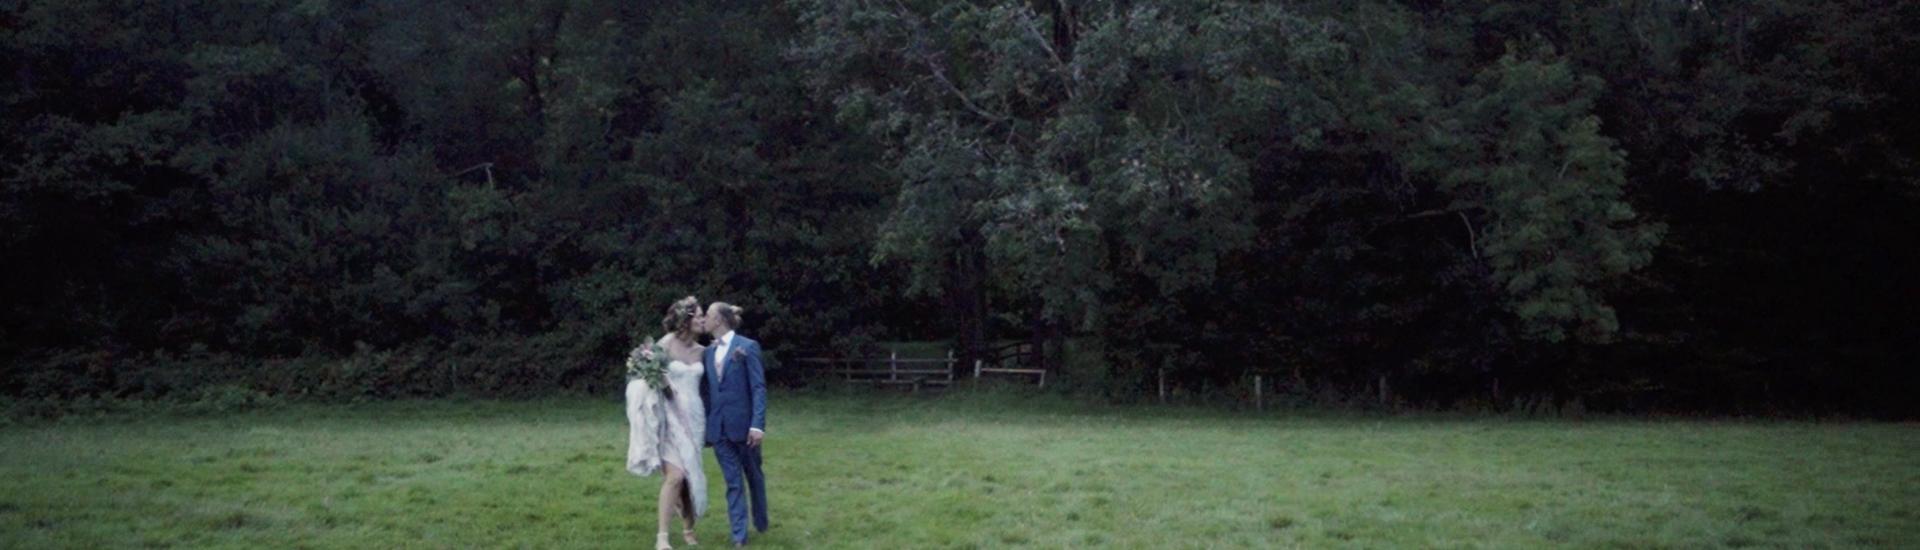 Colehayes Park Wedding Video